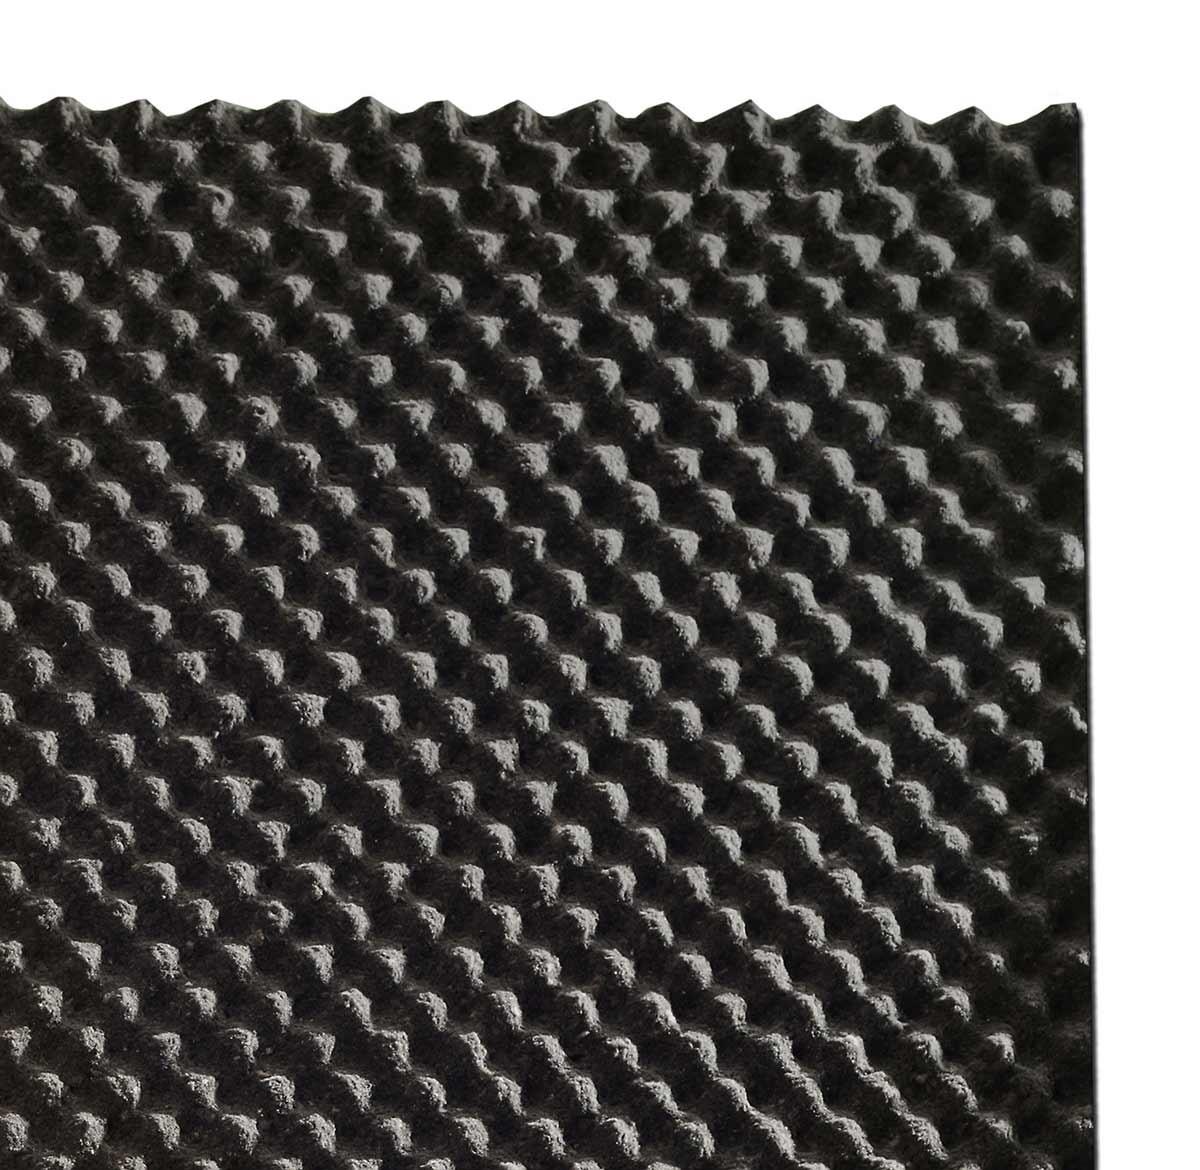 Macsound Prof Волна 1х1х30мм  для звукоизоляции стен